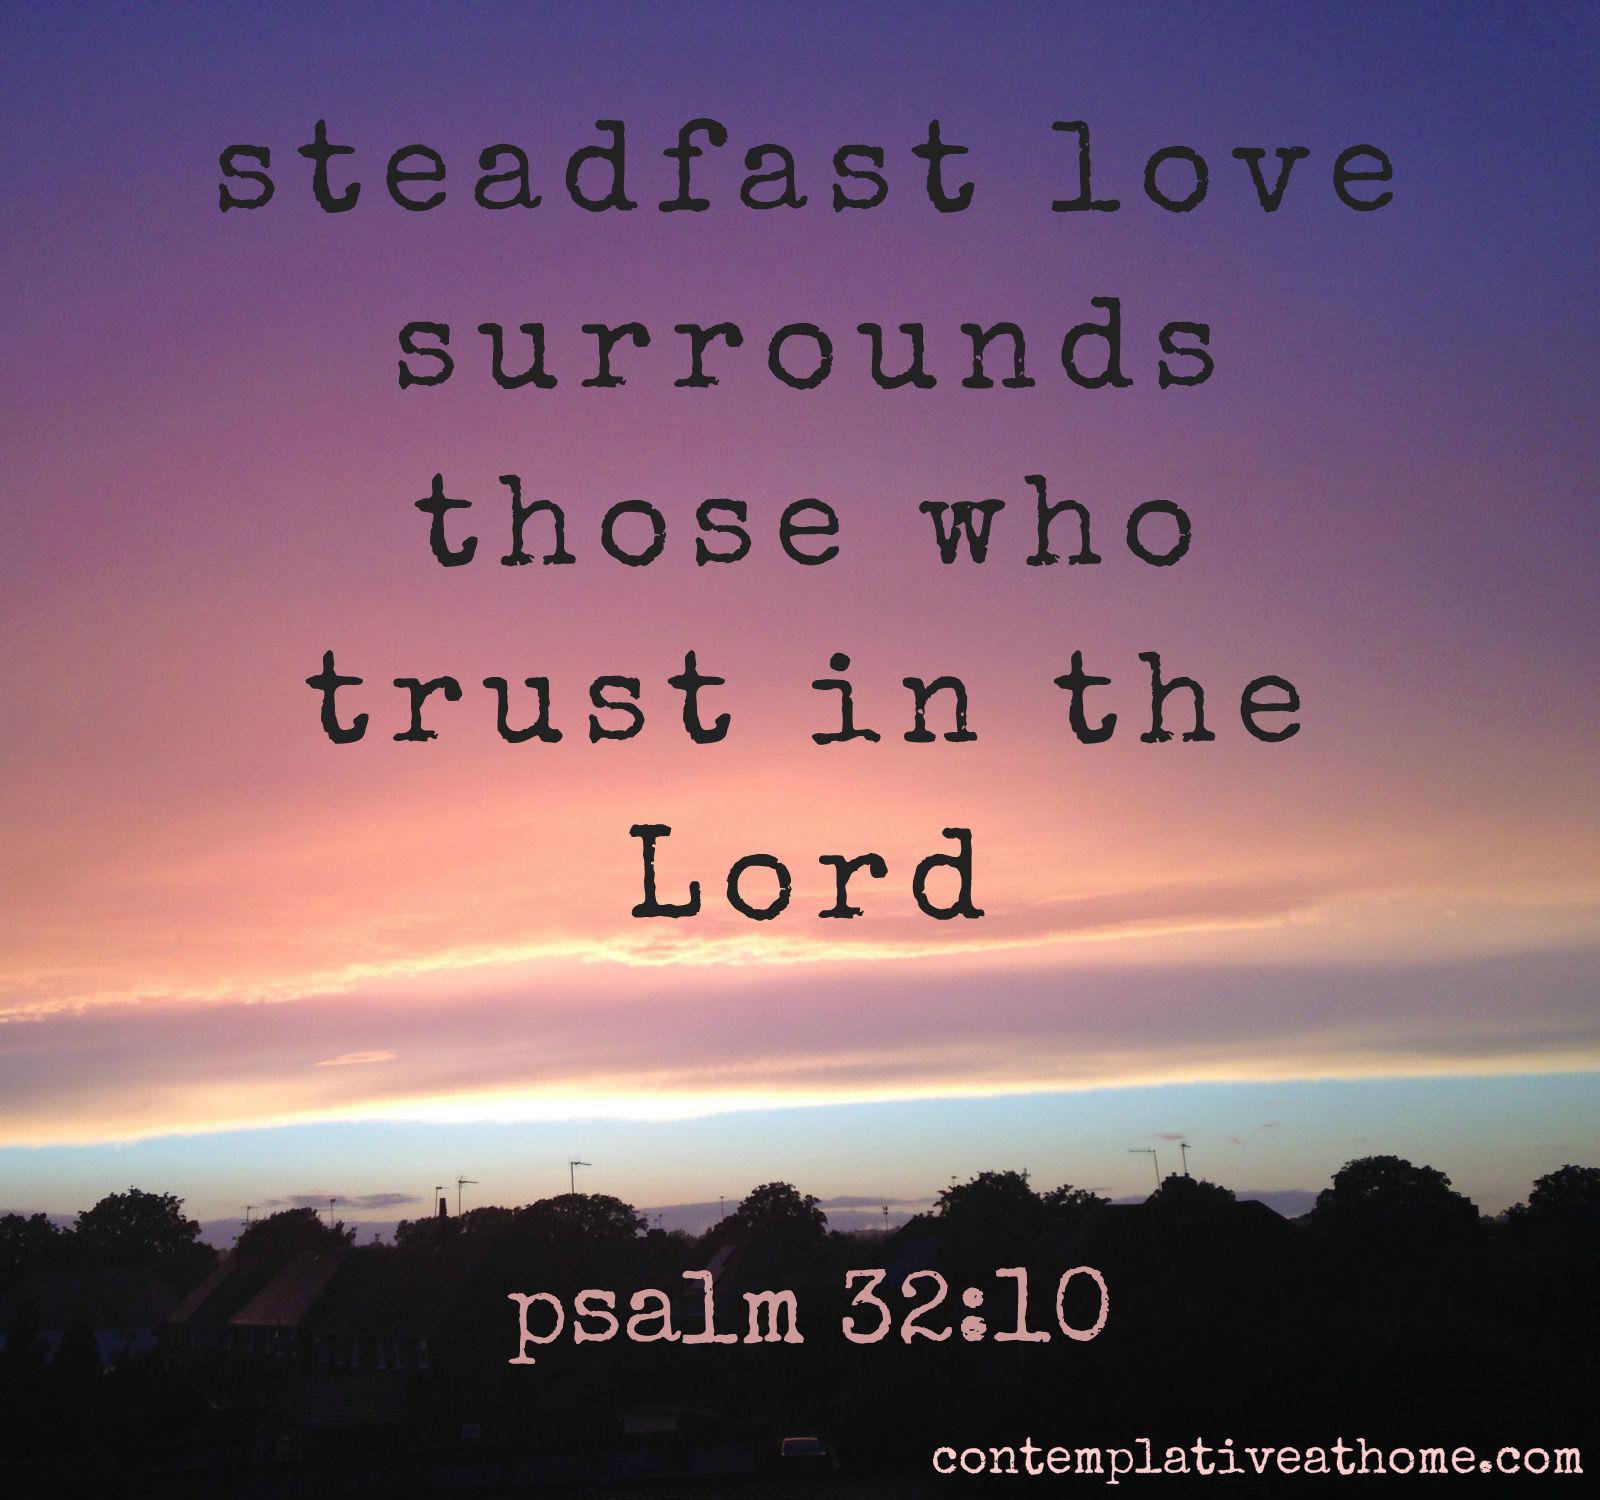 psalm 32.10